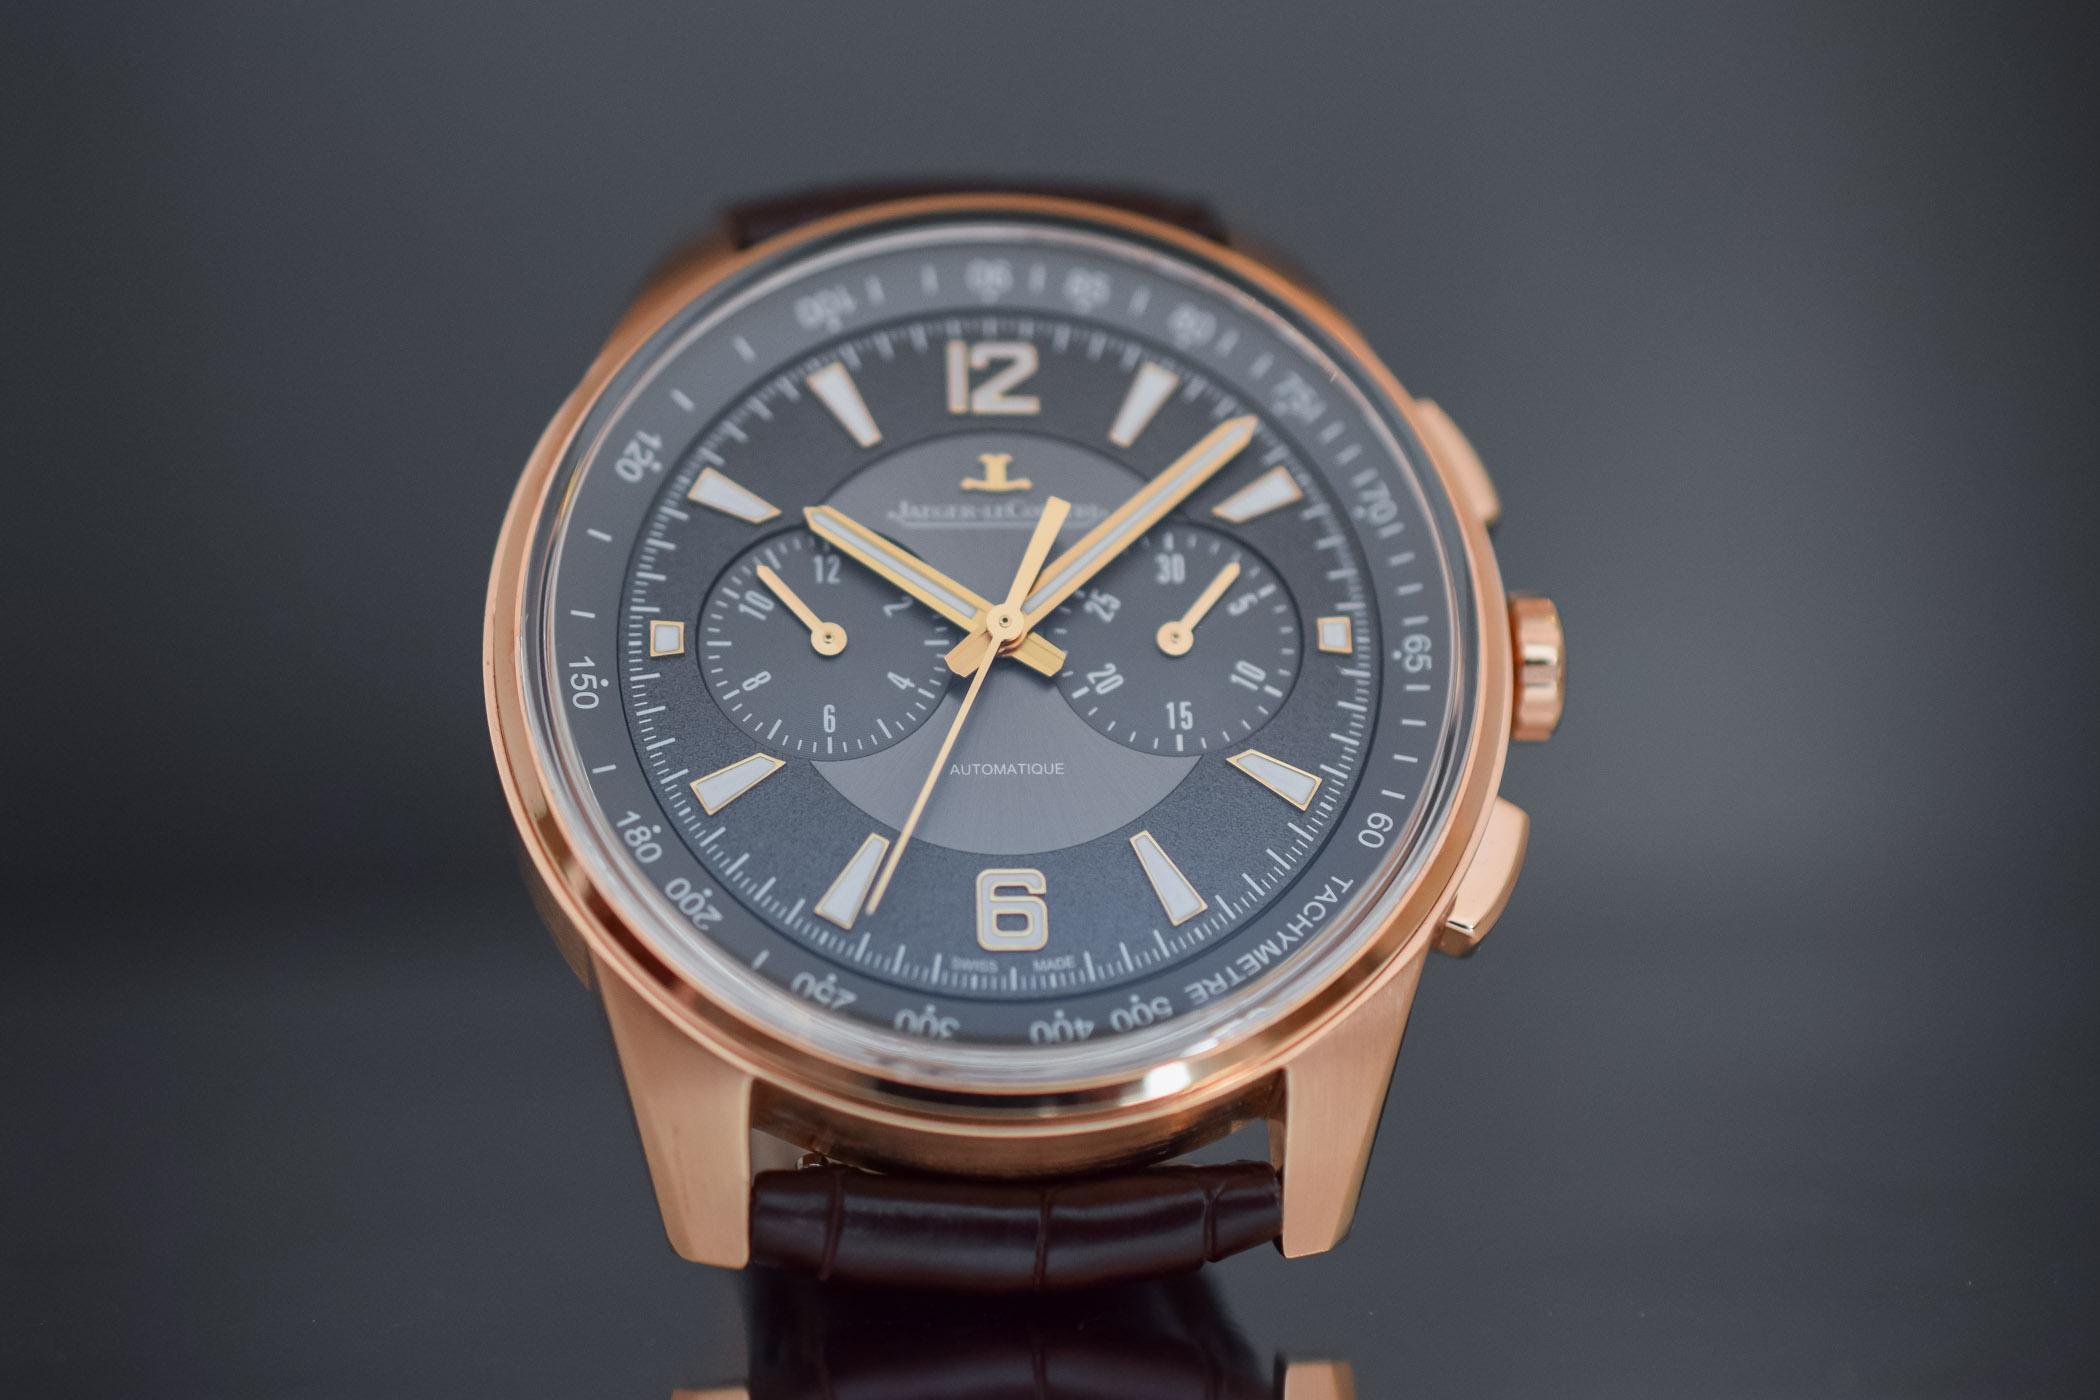 Jaeger LeCoultre Polaris Chronograph 2018 pink gold grey dial